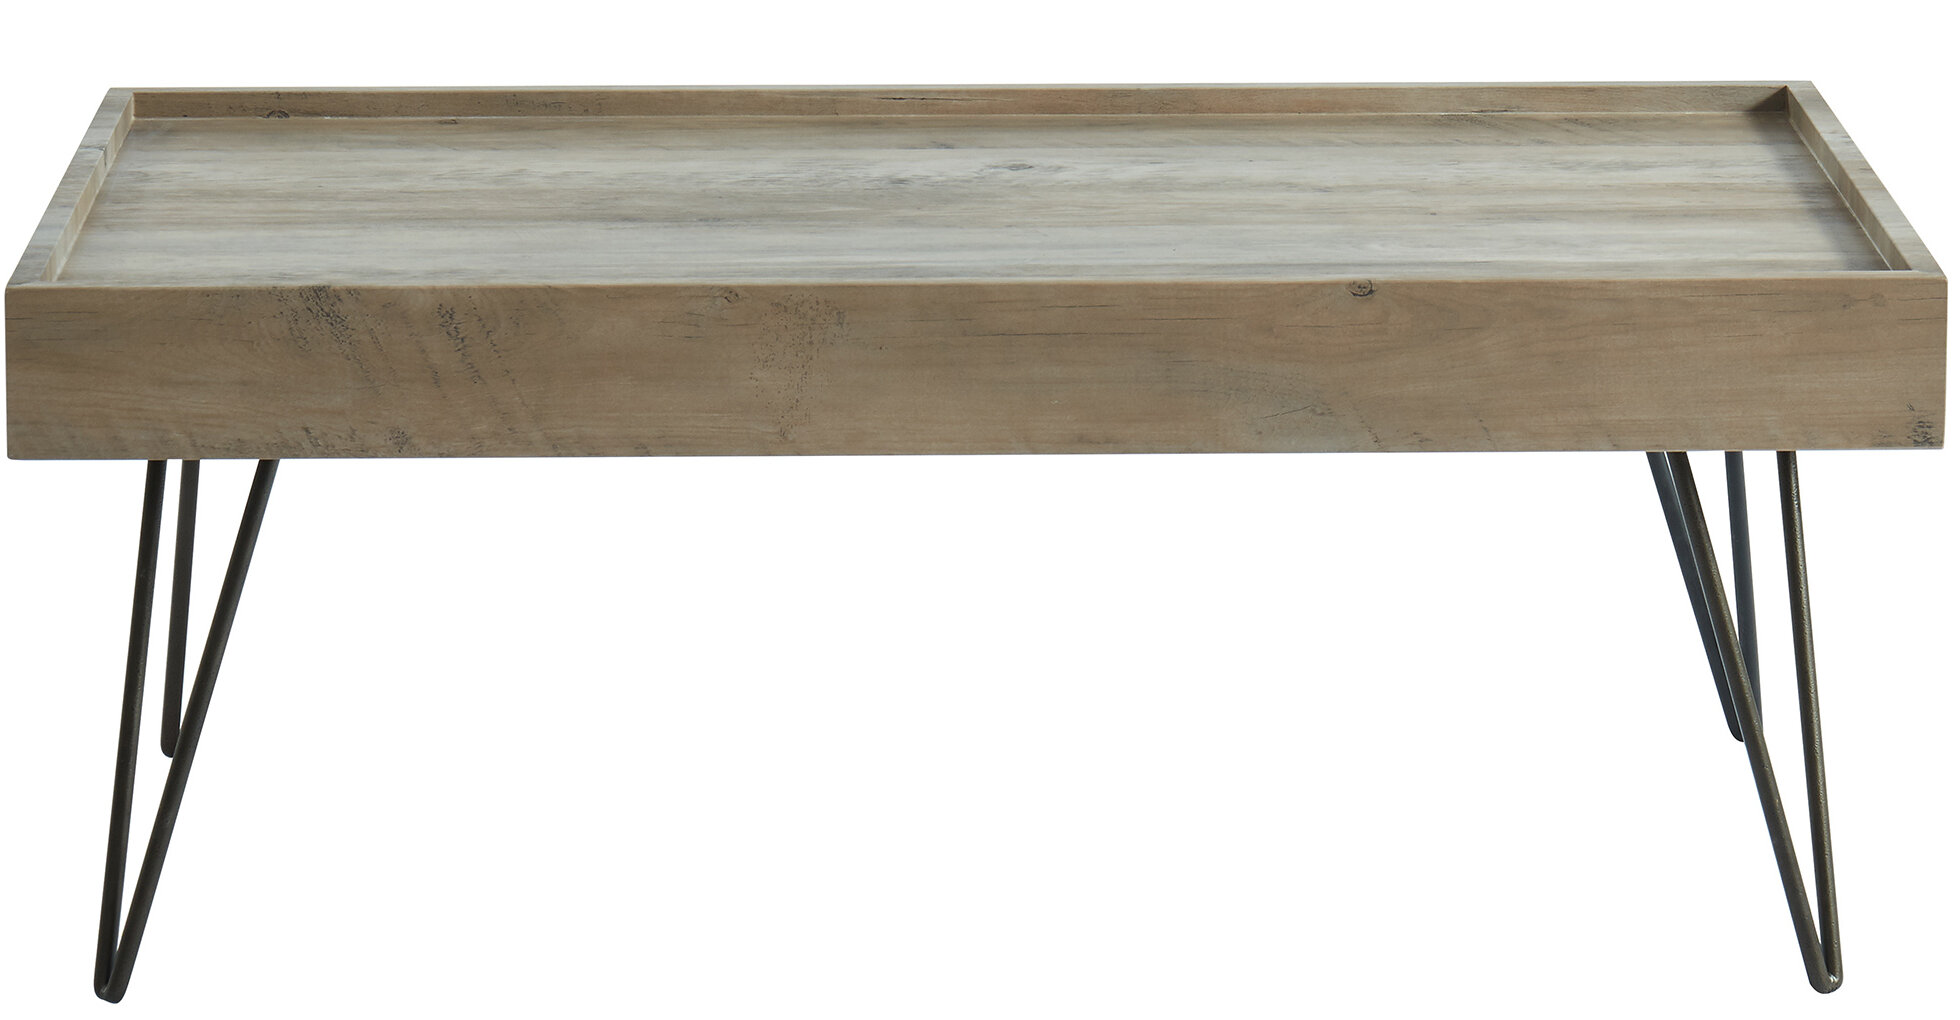 Brilliant Nena Contemporary Tray Coffee Table With Tray Top Machost Co Dining Chair Design Ideas Machostcouk